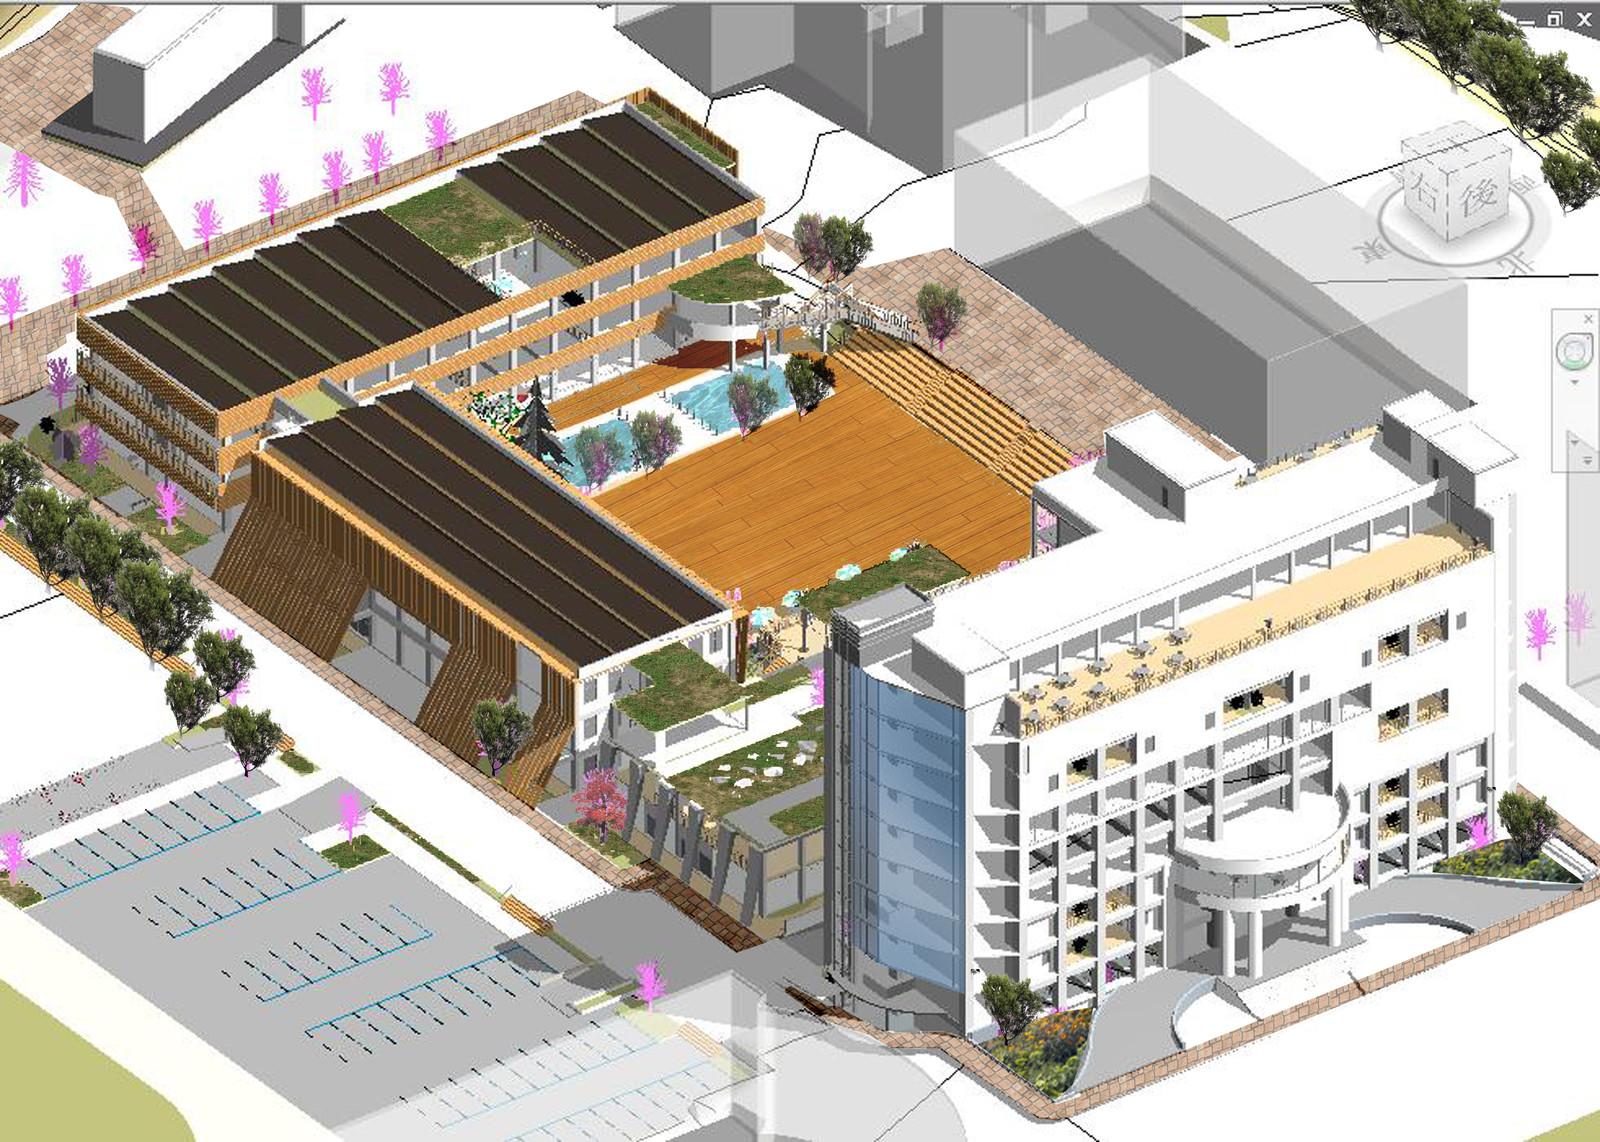 Architecture design - NUU college school